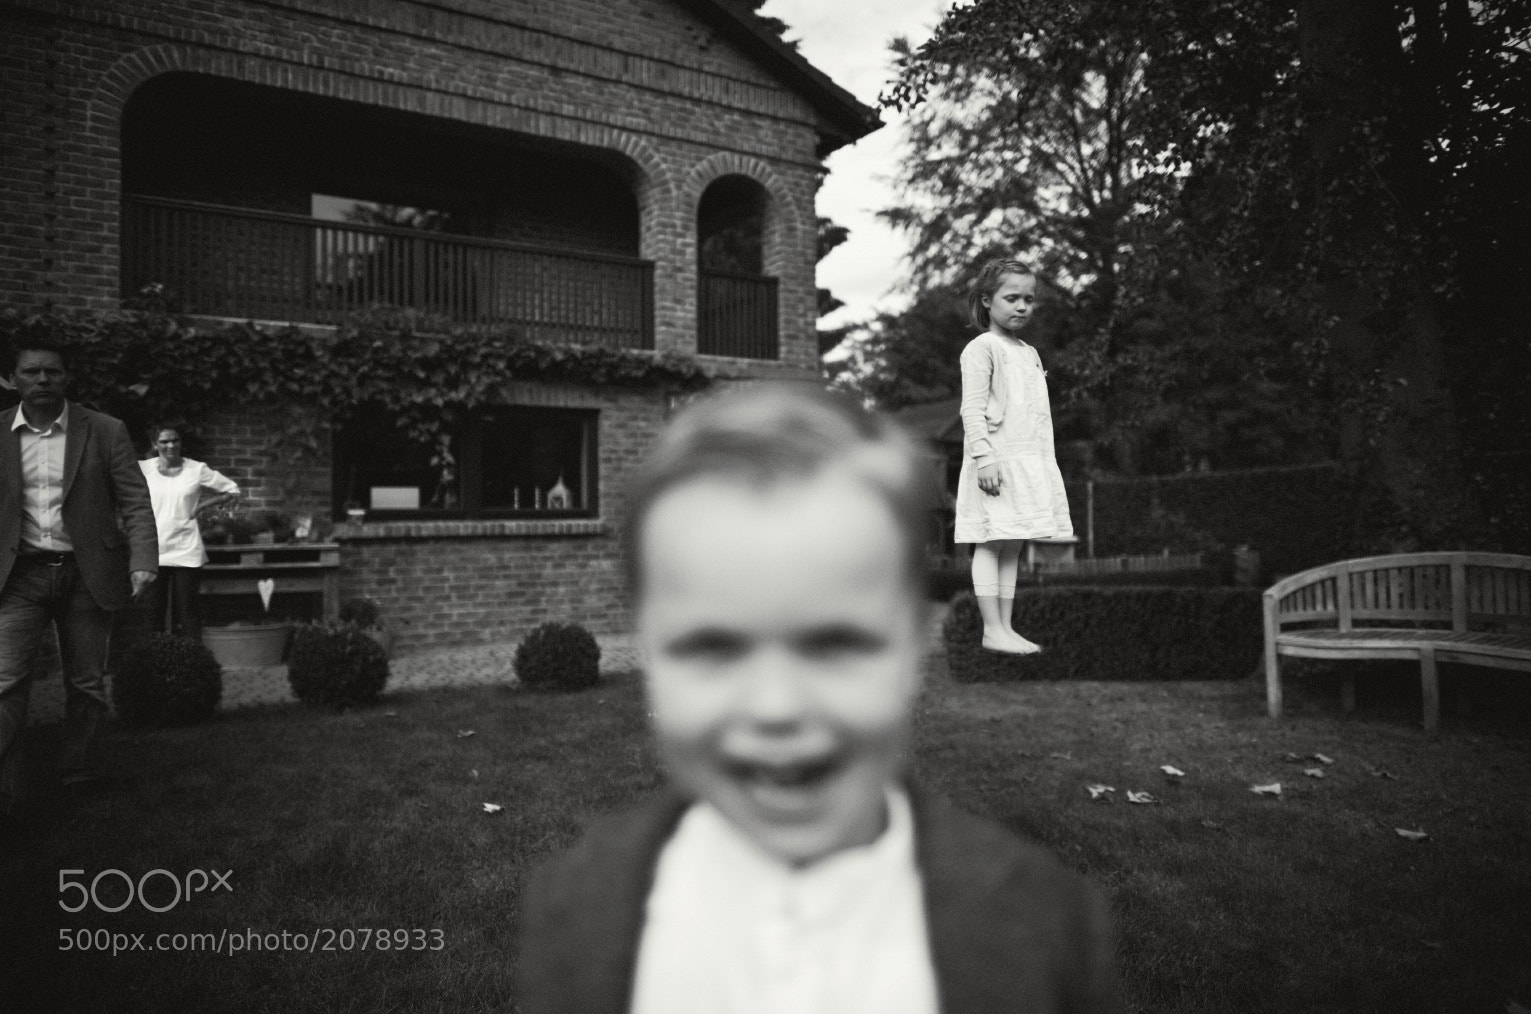 Photograph A Family Portrait by Steffen Böttcher on 500px